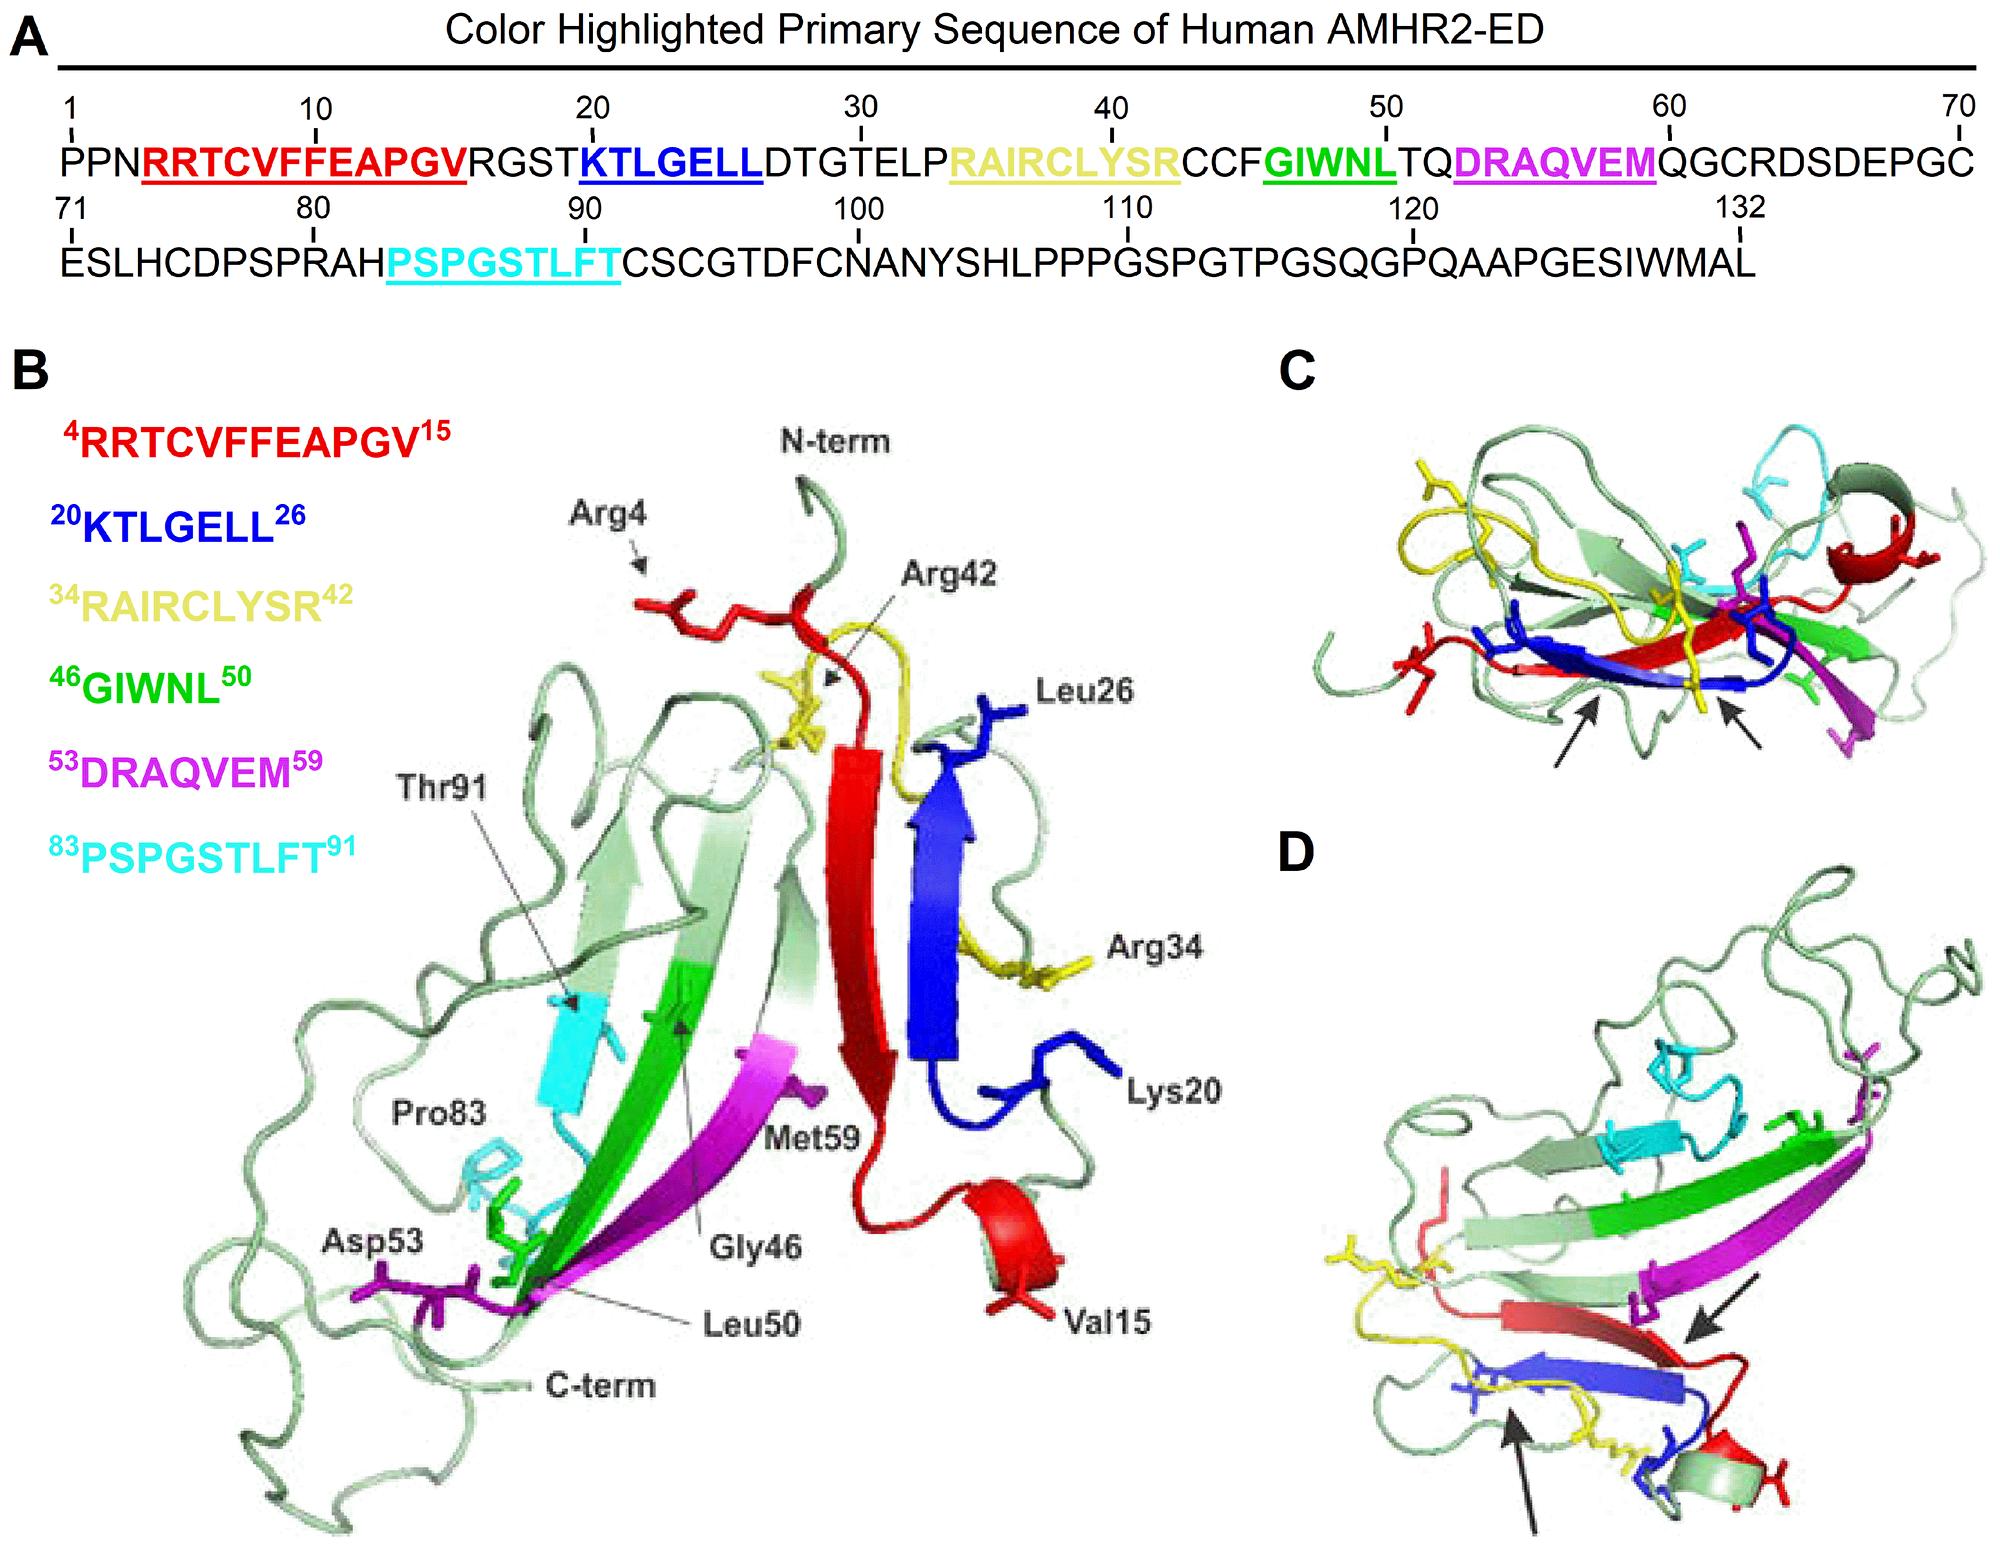 Molecular modeling of human AMHR2-ED.